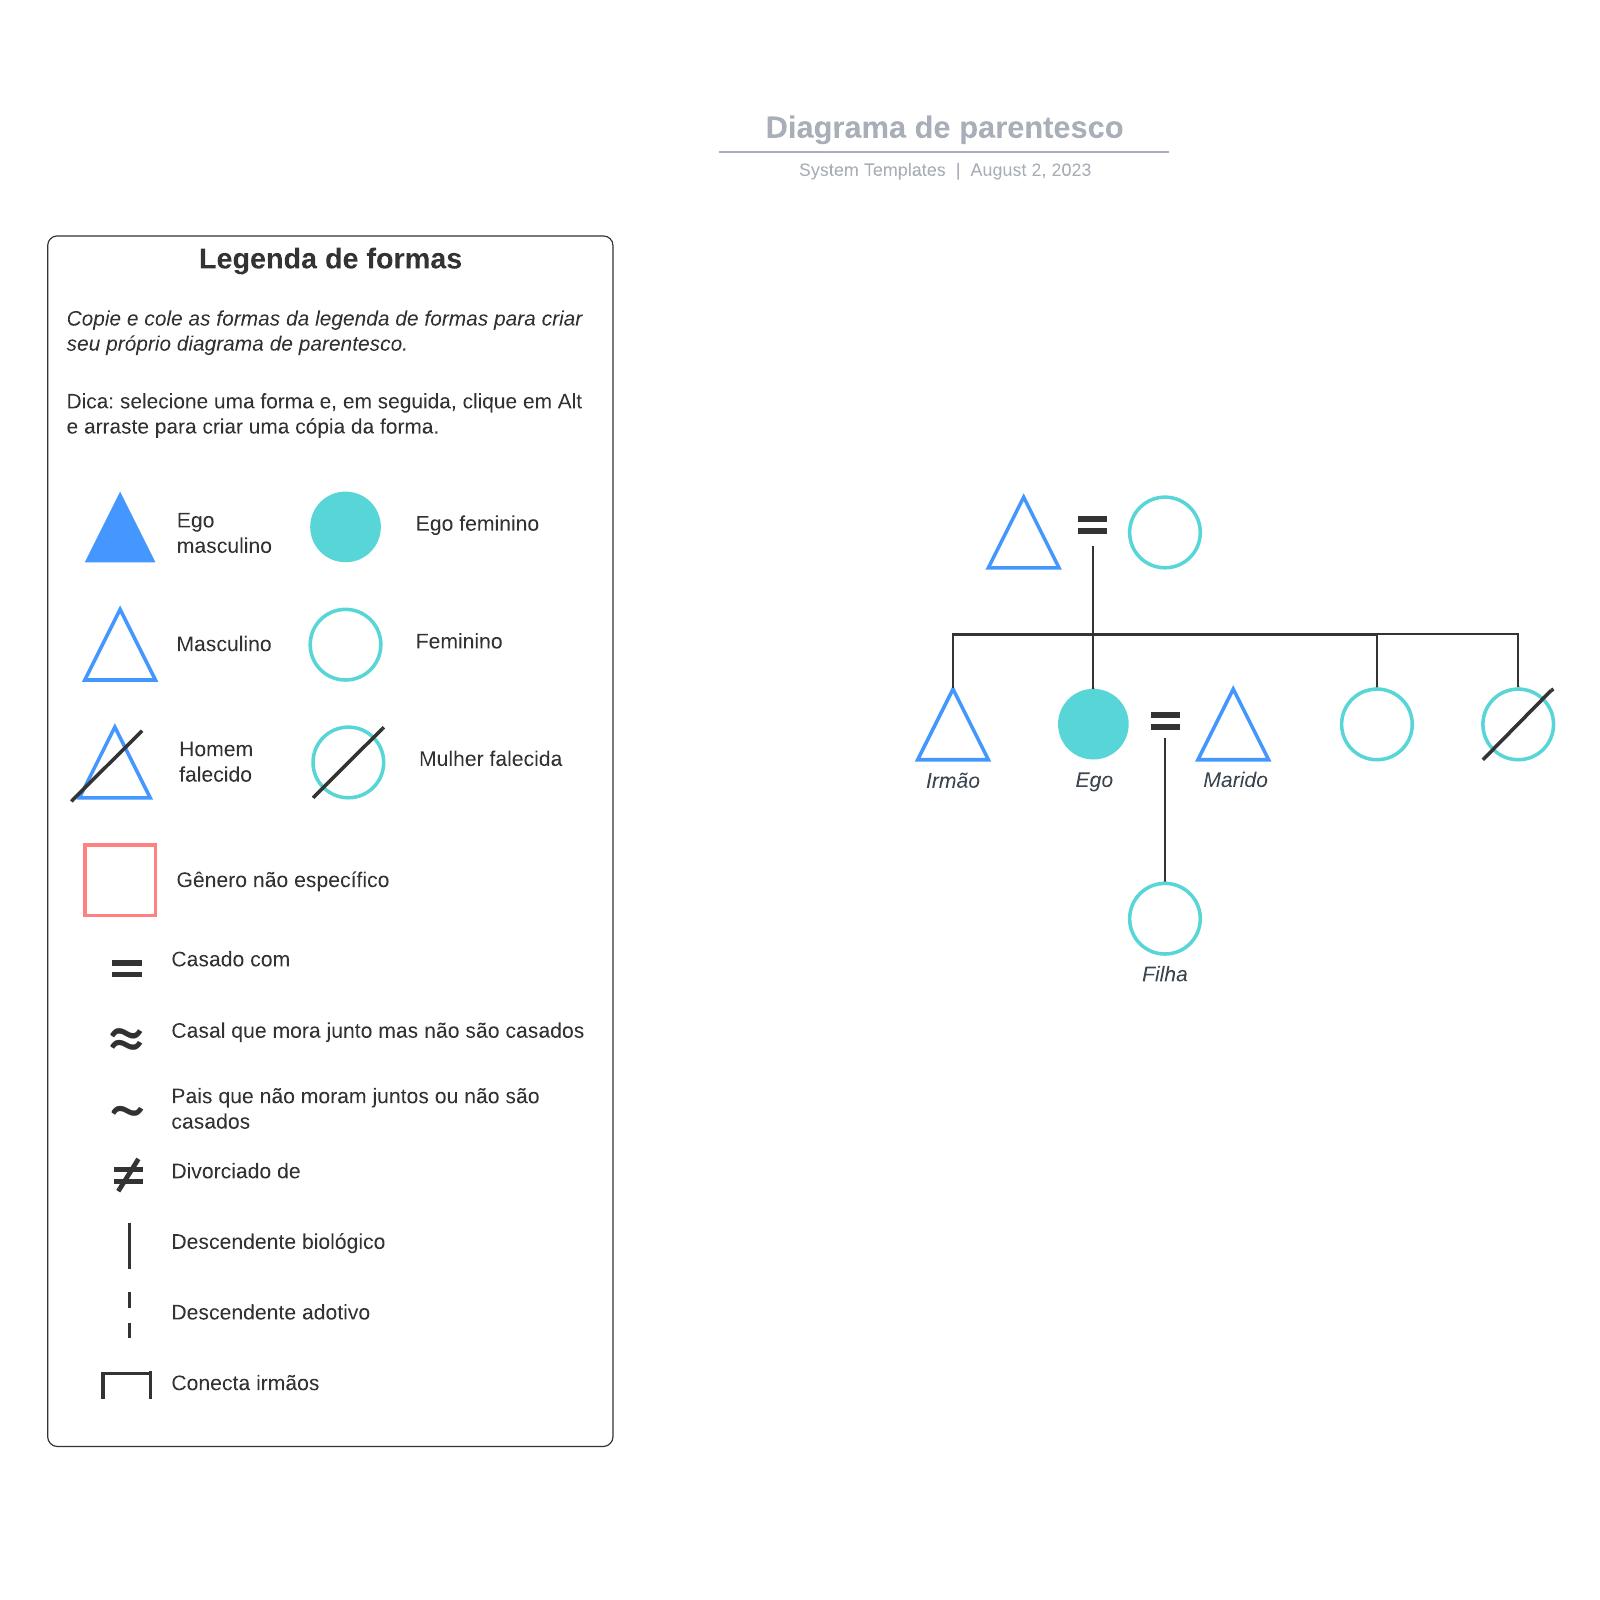 Diagrama de parentesco